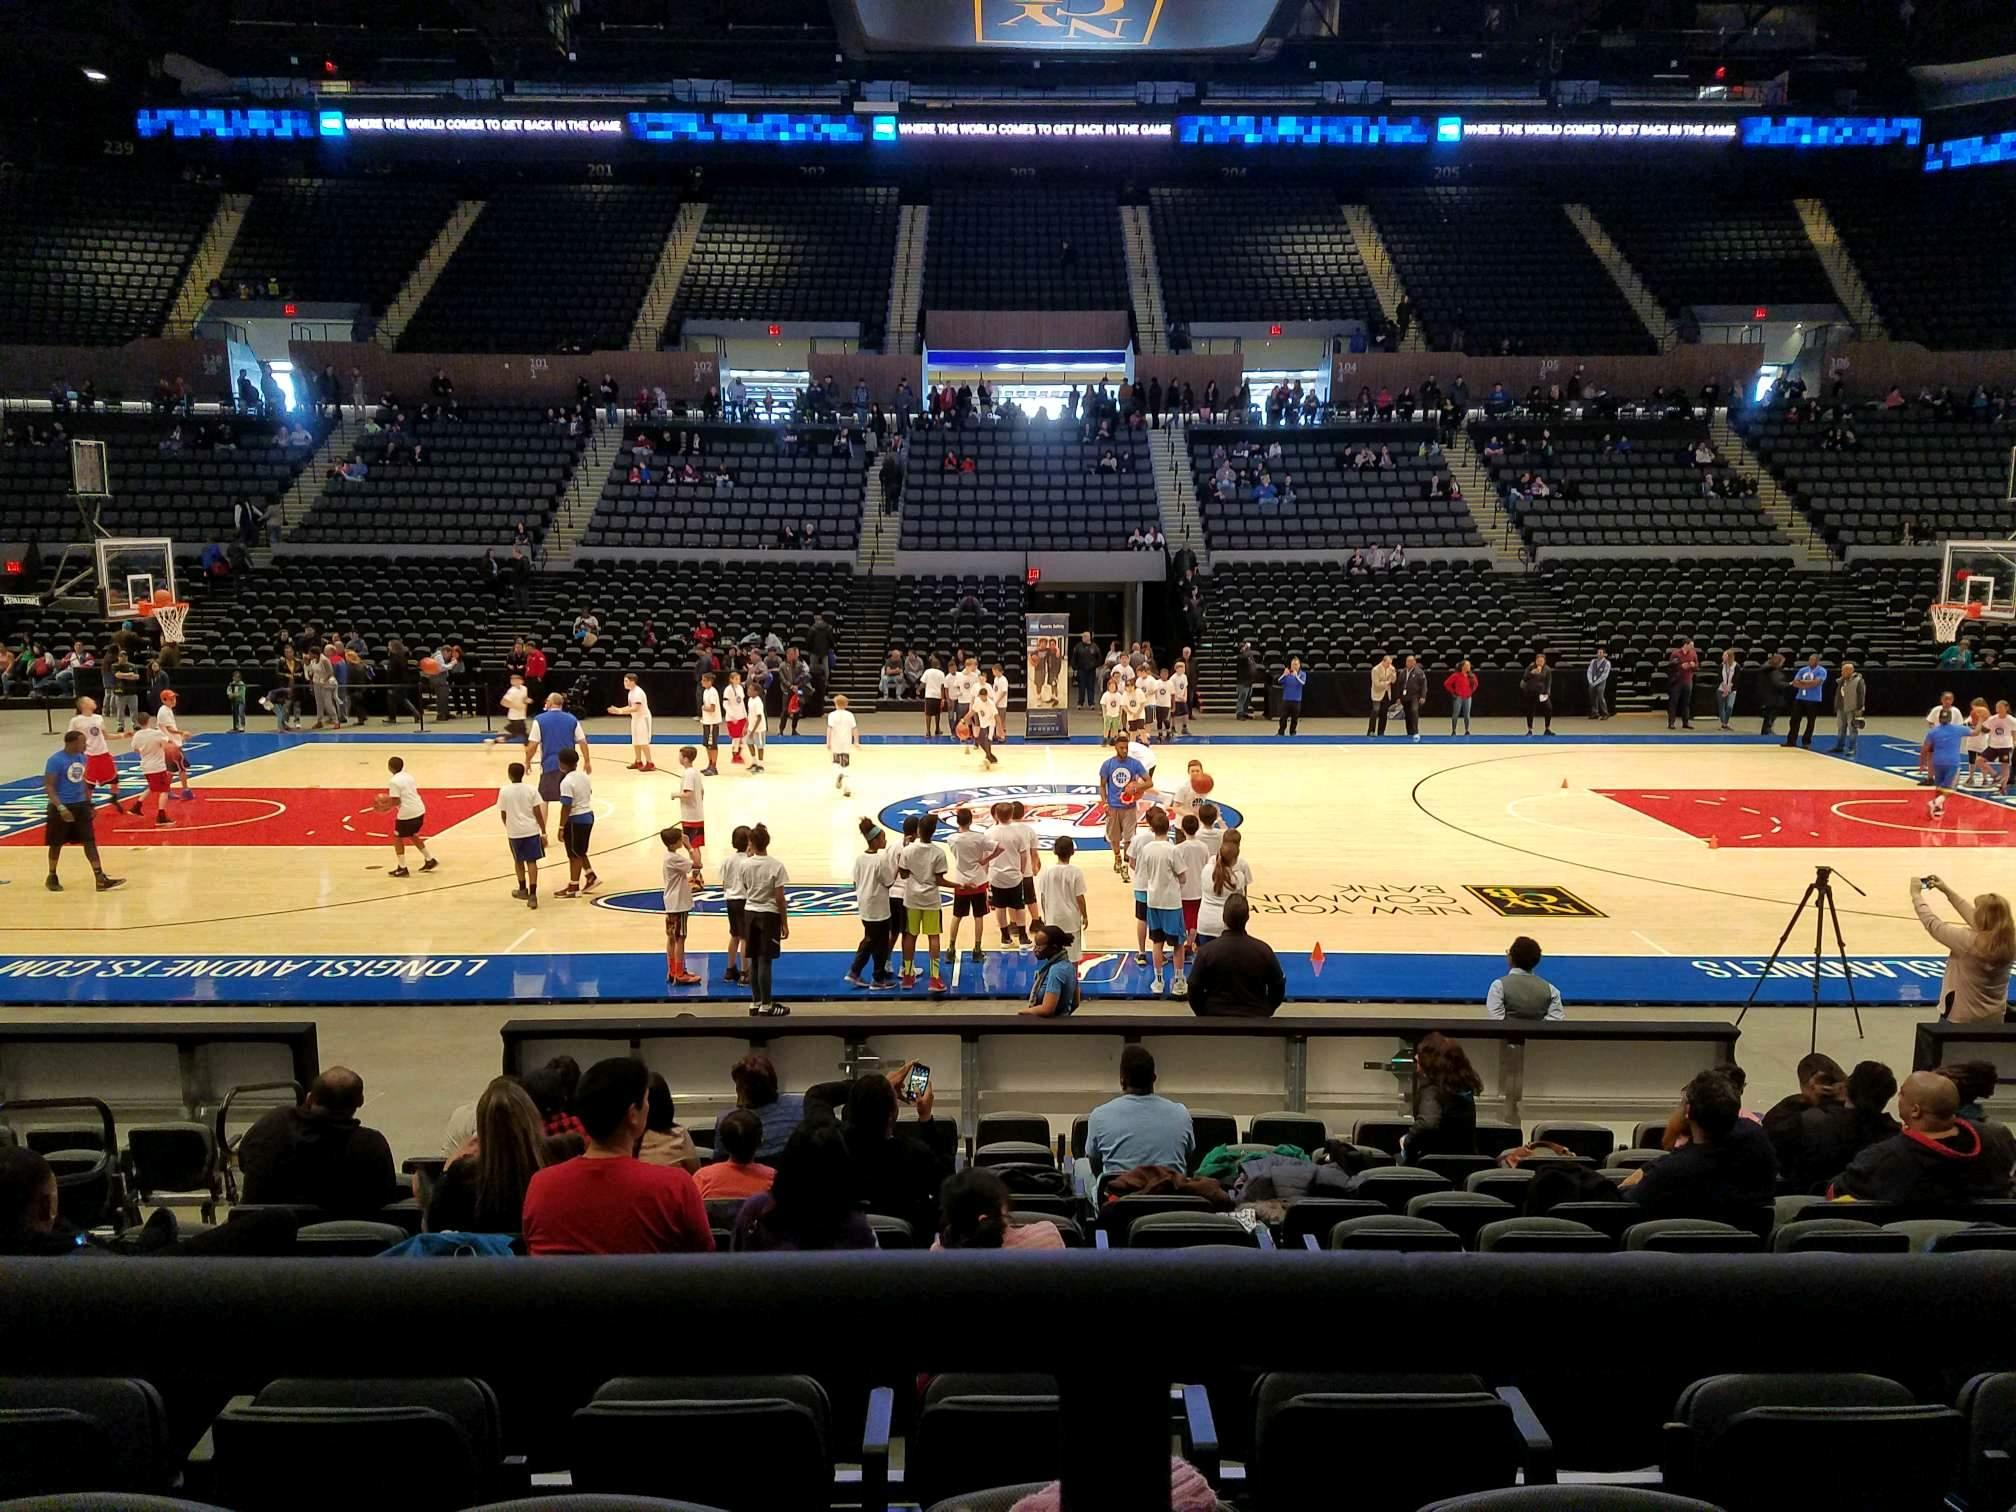 Nassau Veterans Memorial Coliseum Section 117 Row 1 Seat 9